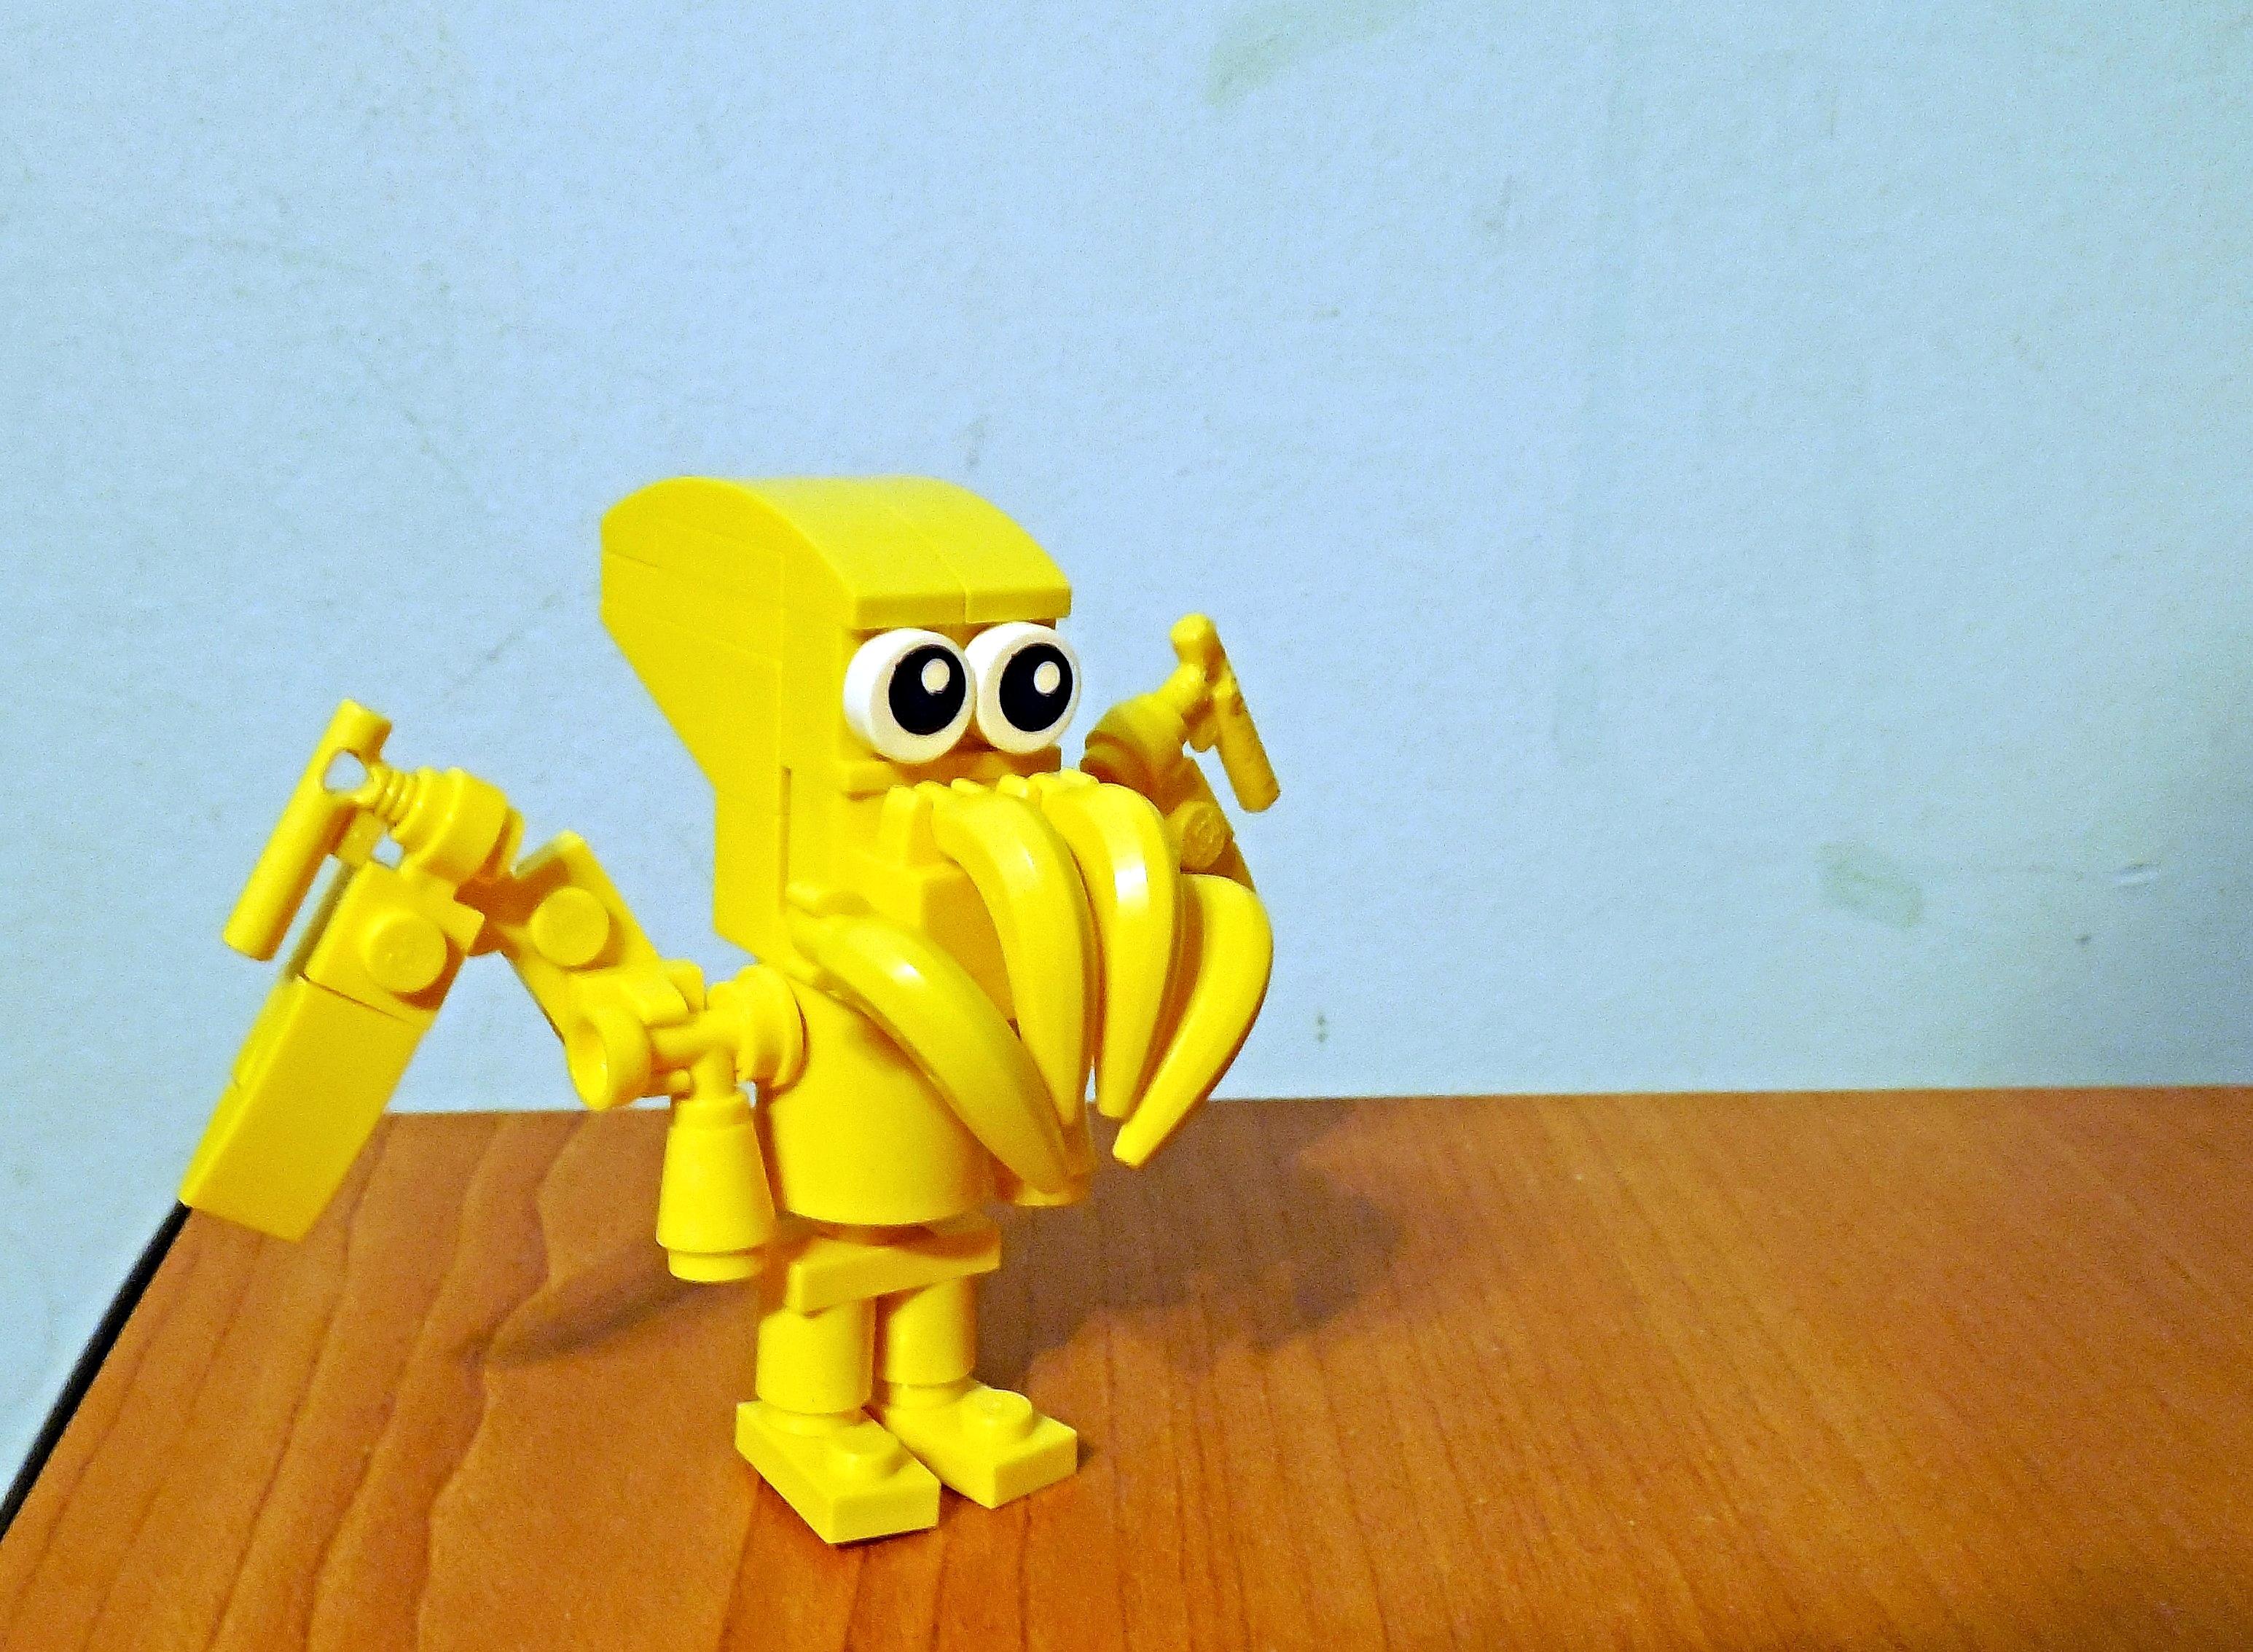 LEGO® MOC by Vitreolum: Nana Cthulhu